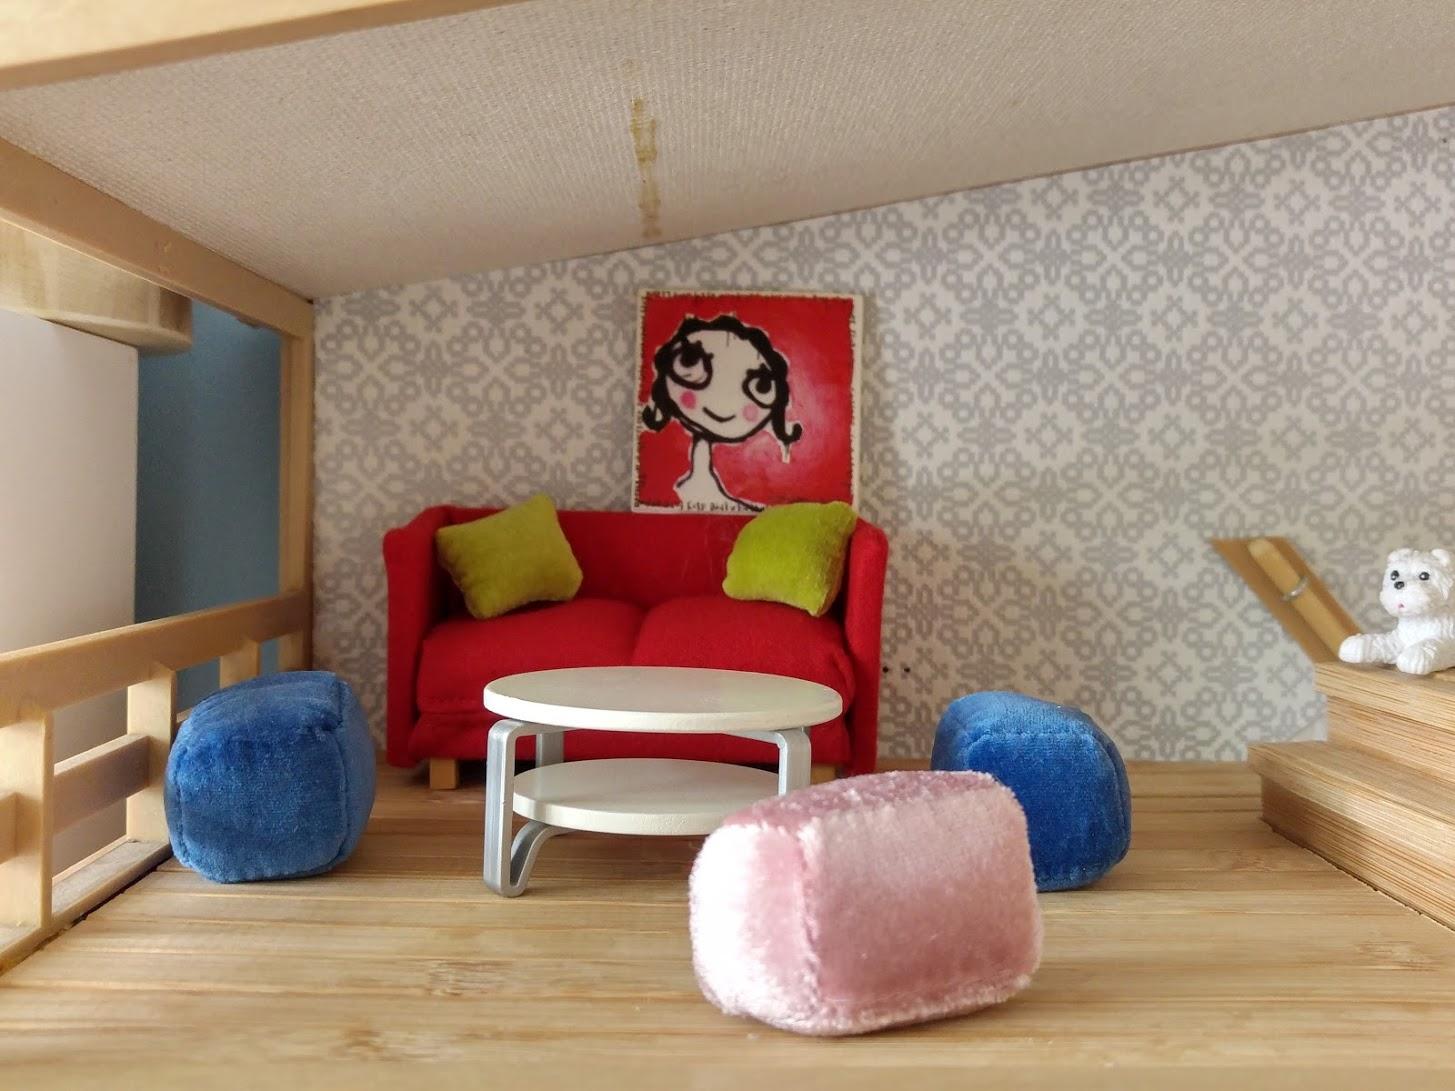 Modern Lundby Smaland furniture